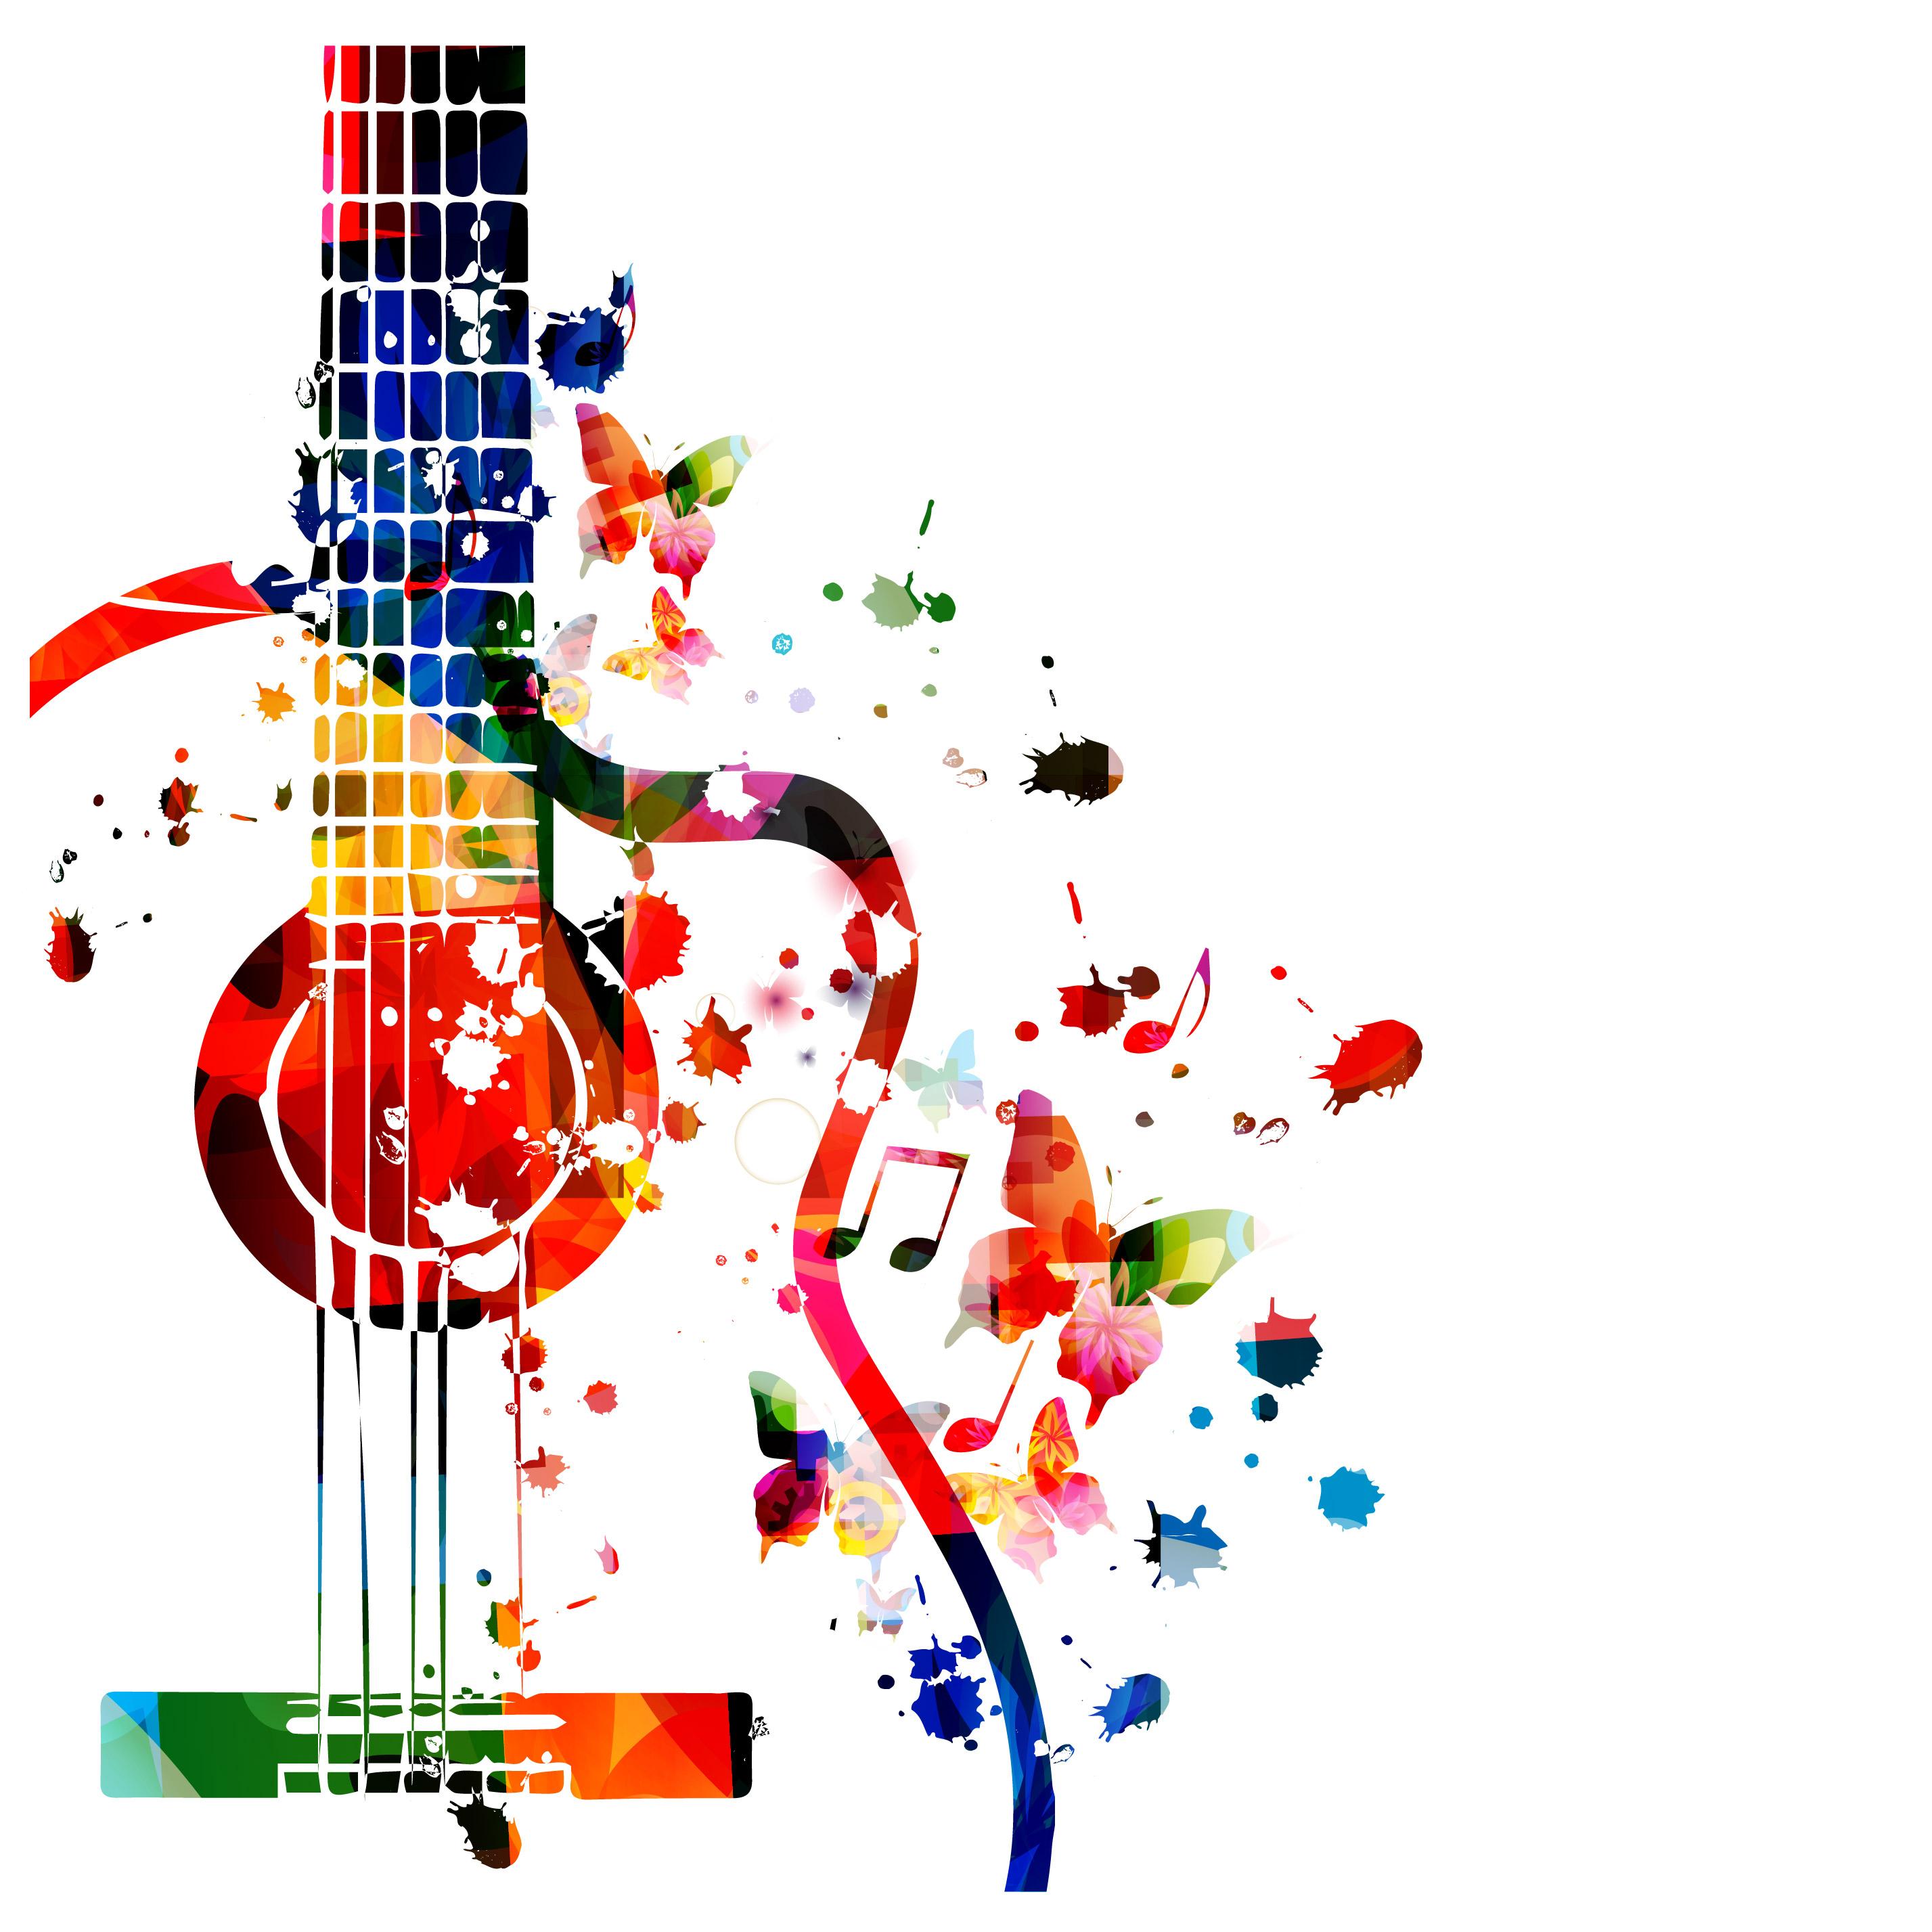 KulturFreitag. Bild: AdobeStock